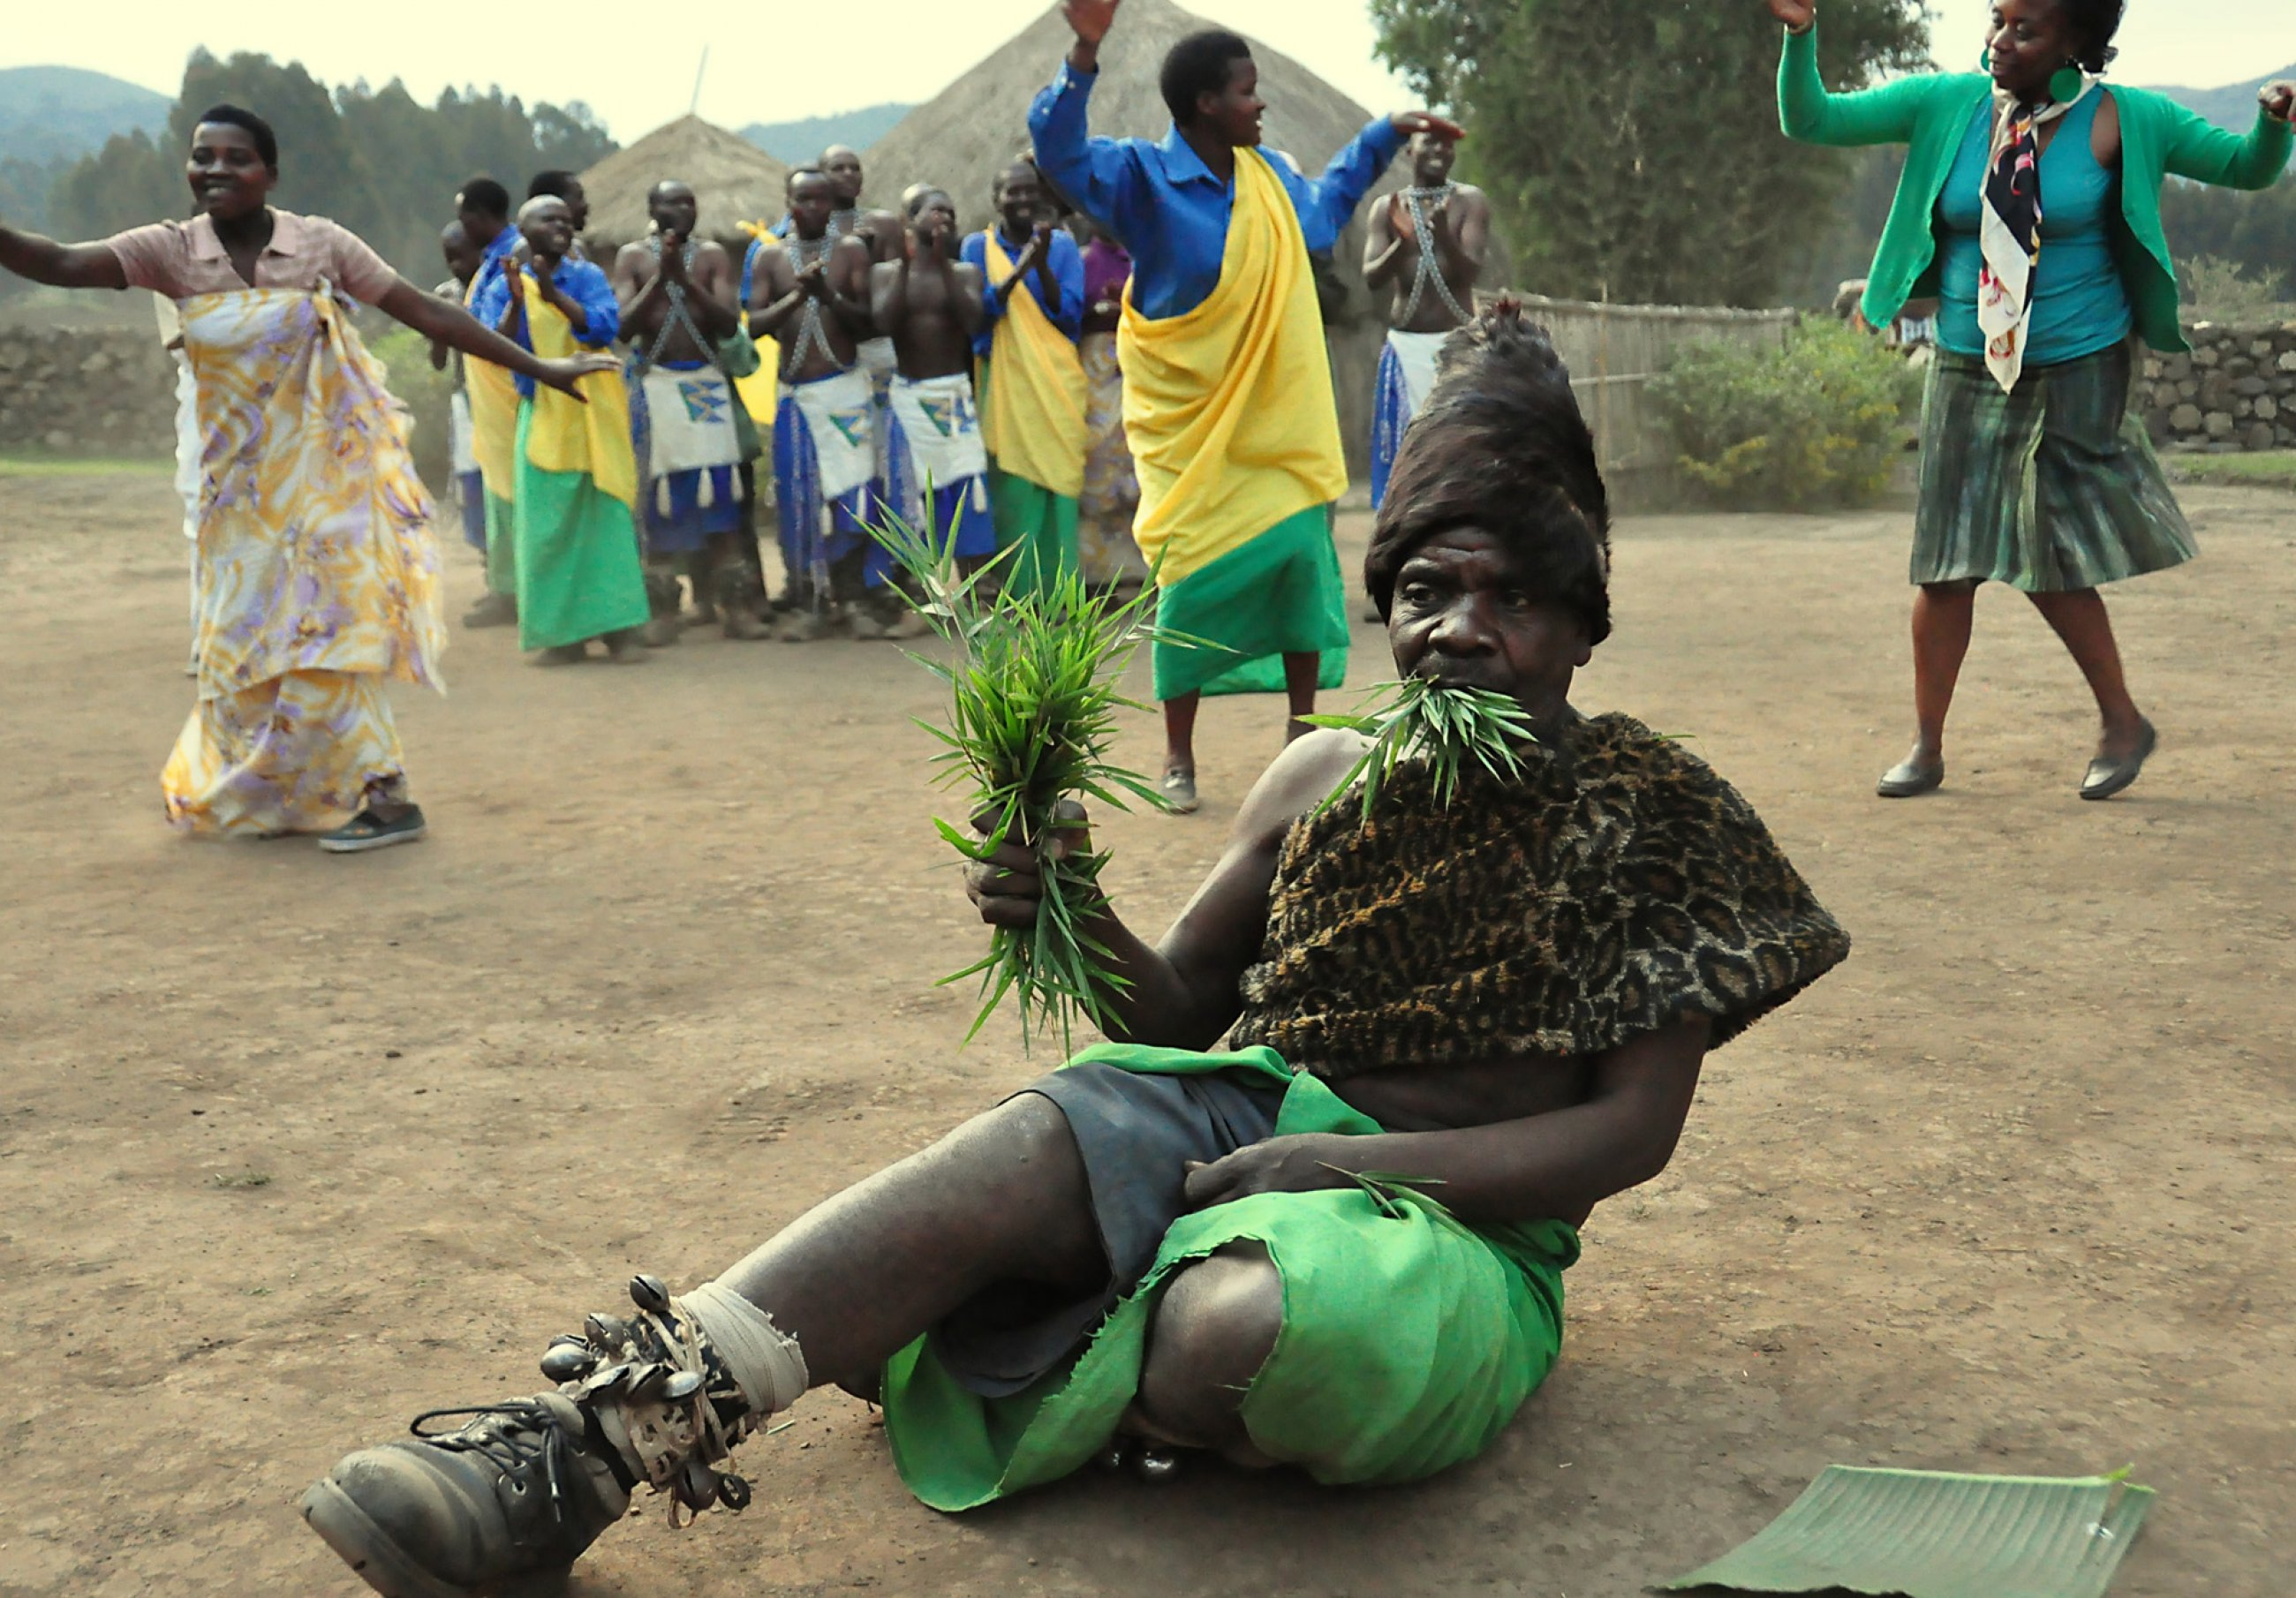 https://bubo.sk/uploads/galleries/4986/burundi-rwanda-uganda-kongo-martin-karnis-4032-4-.jpg